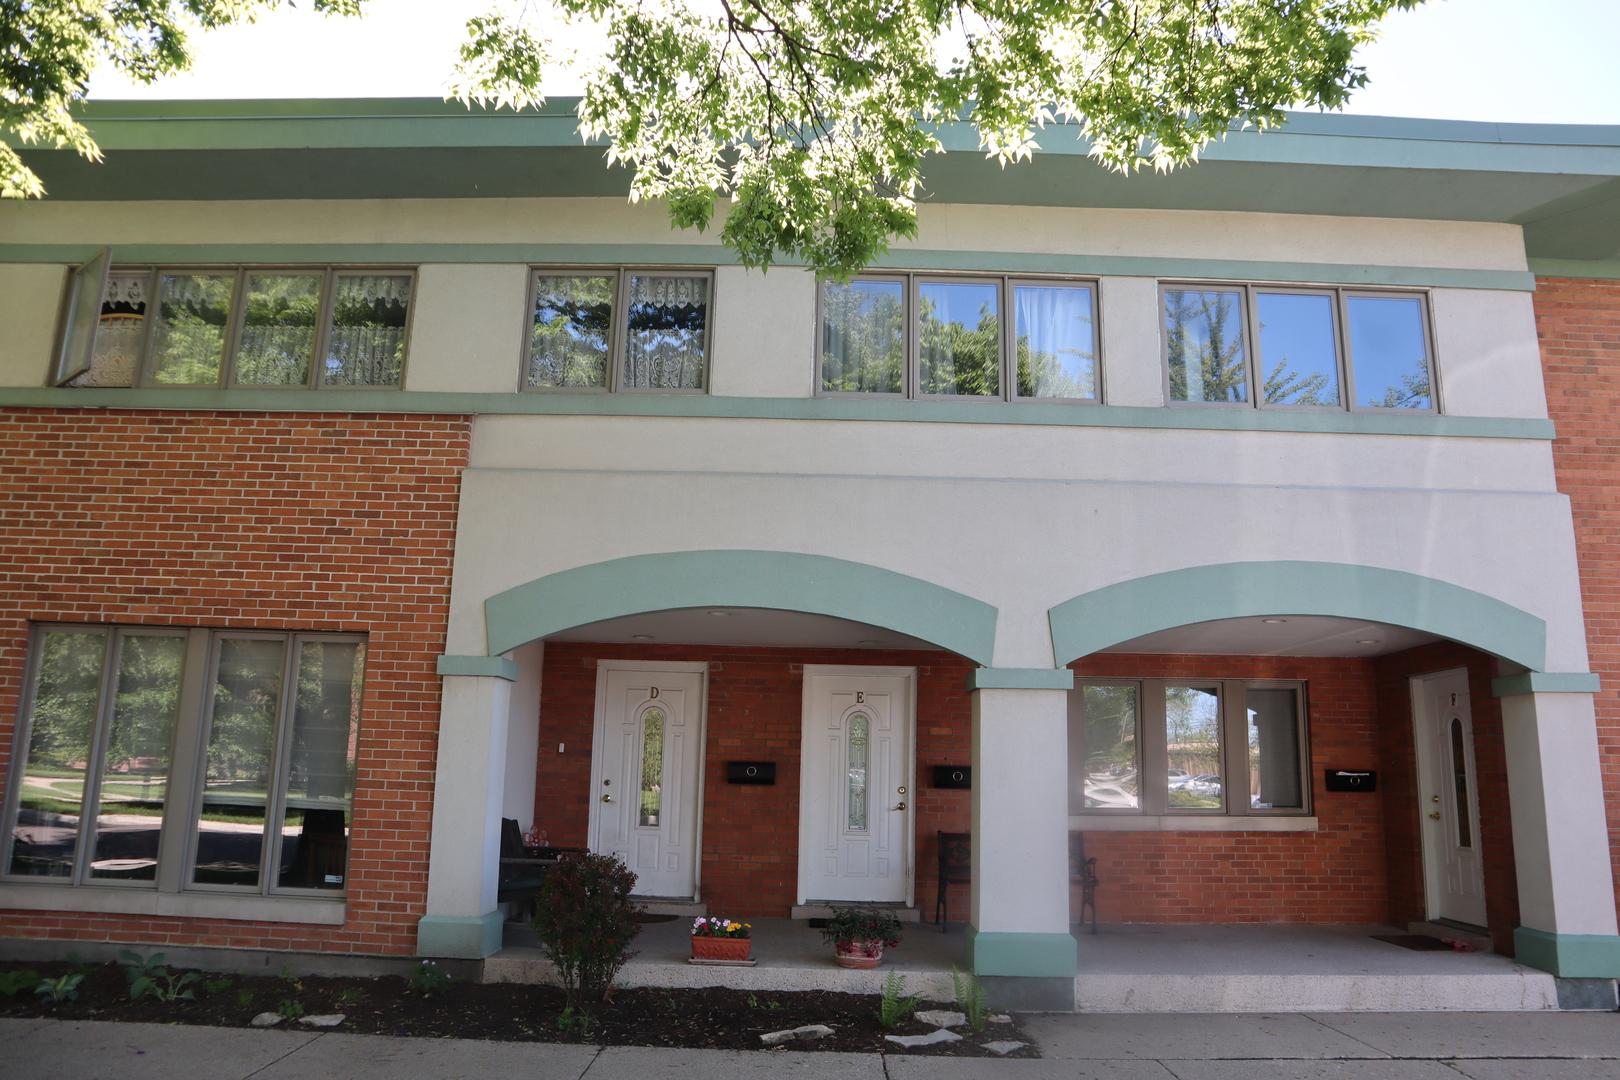 601 South Boulevard, Oak Park, Illinois 60302, 3 Bedrooms Bedrooms, ,4 BathroomsBathrooms,Townhouse,For Sale,601 South Boulevard,11043452